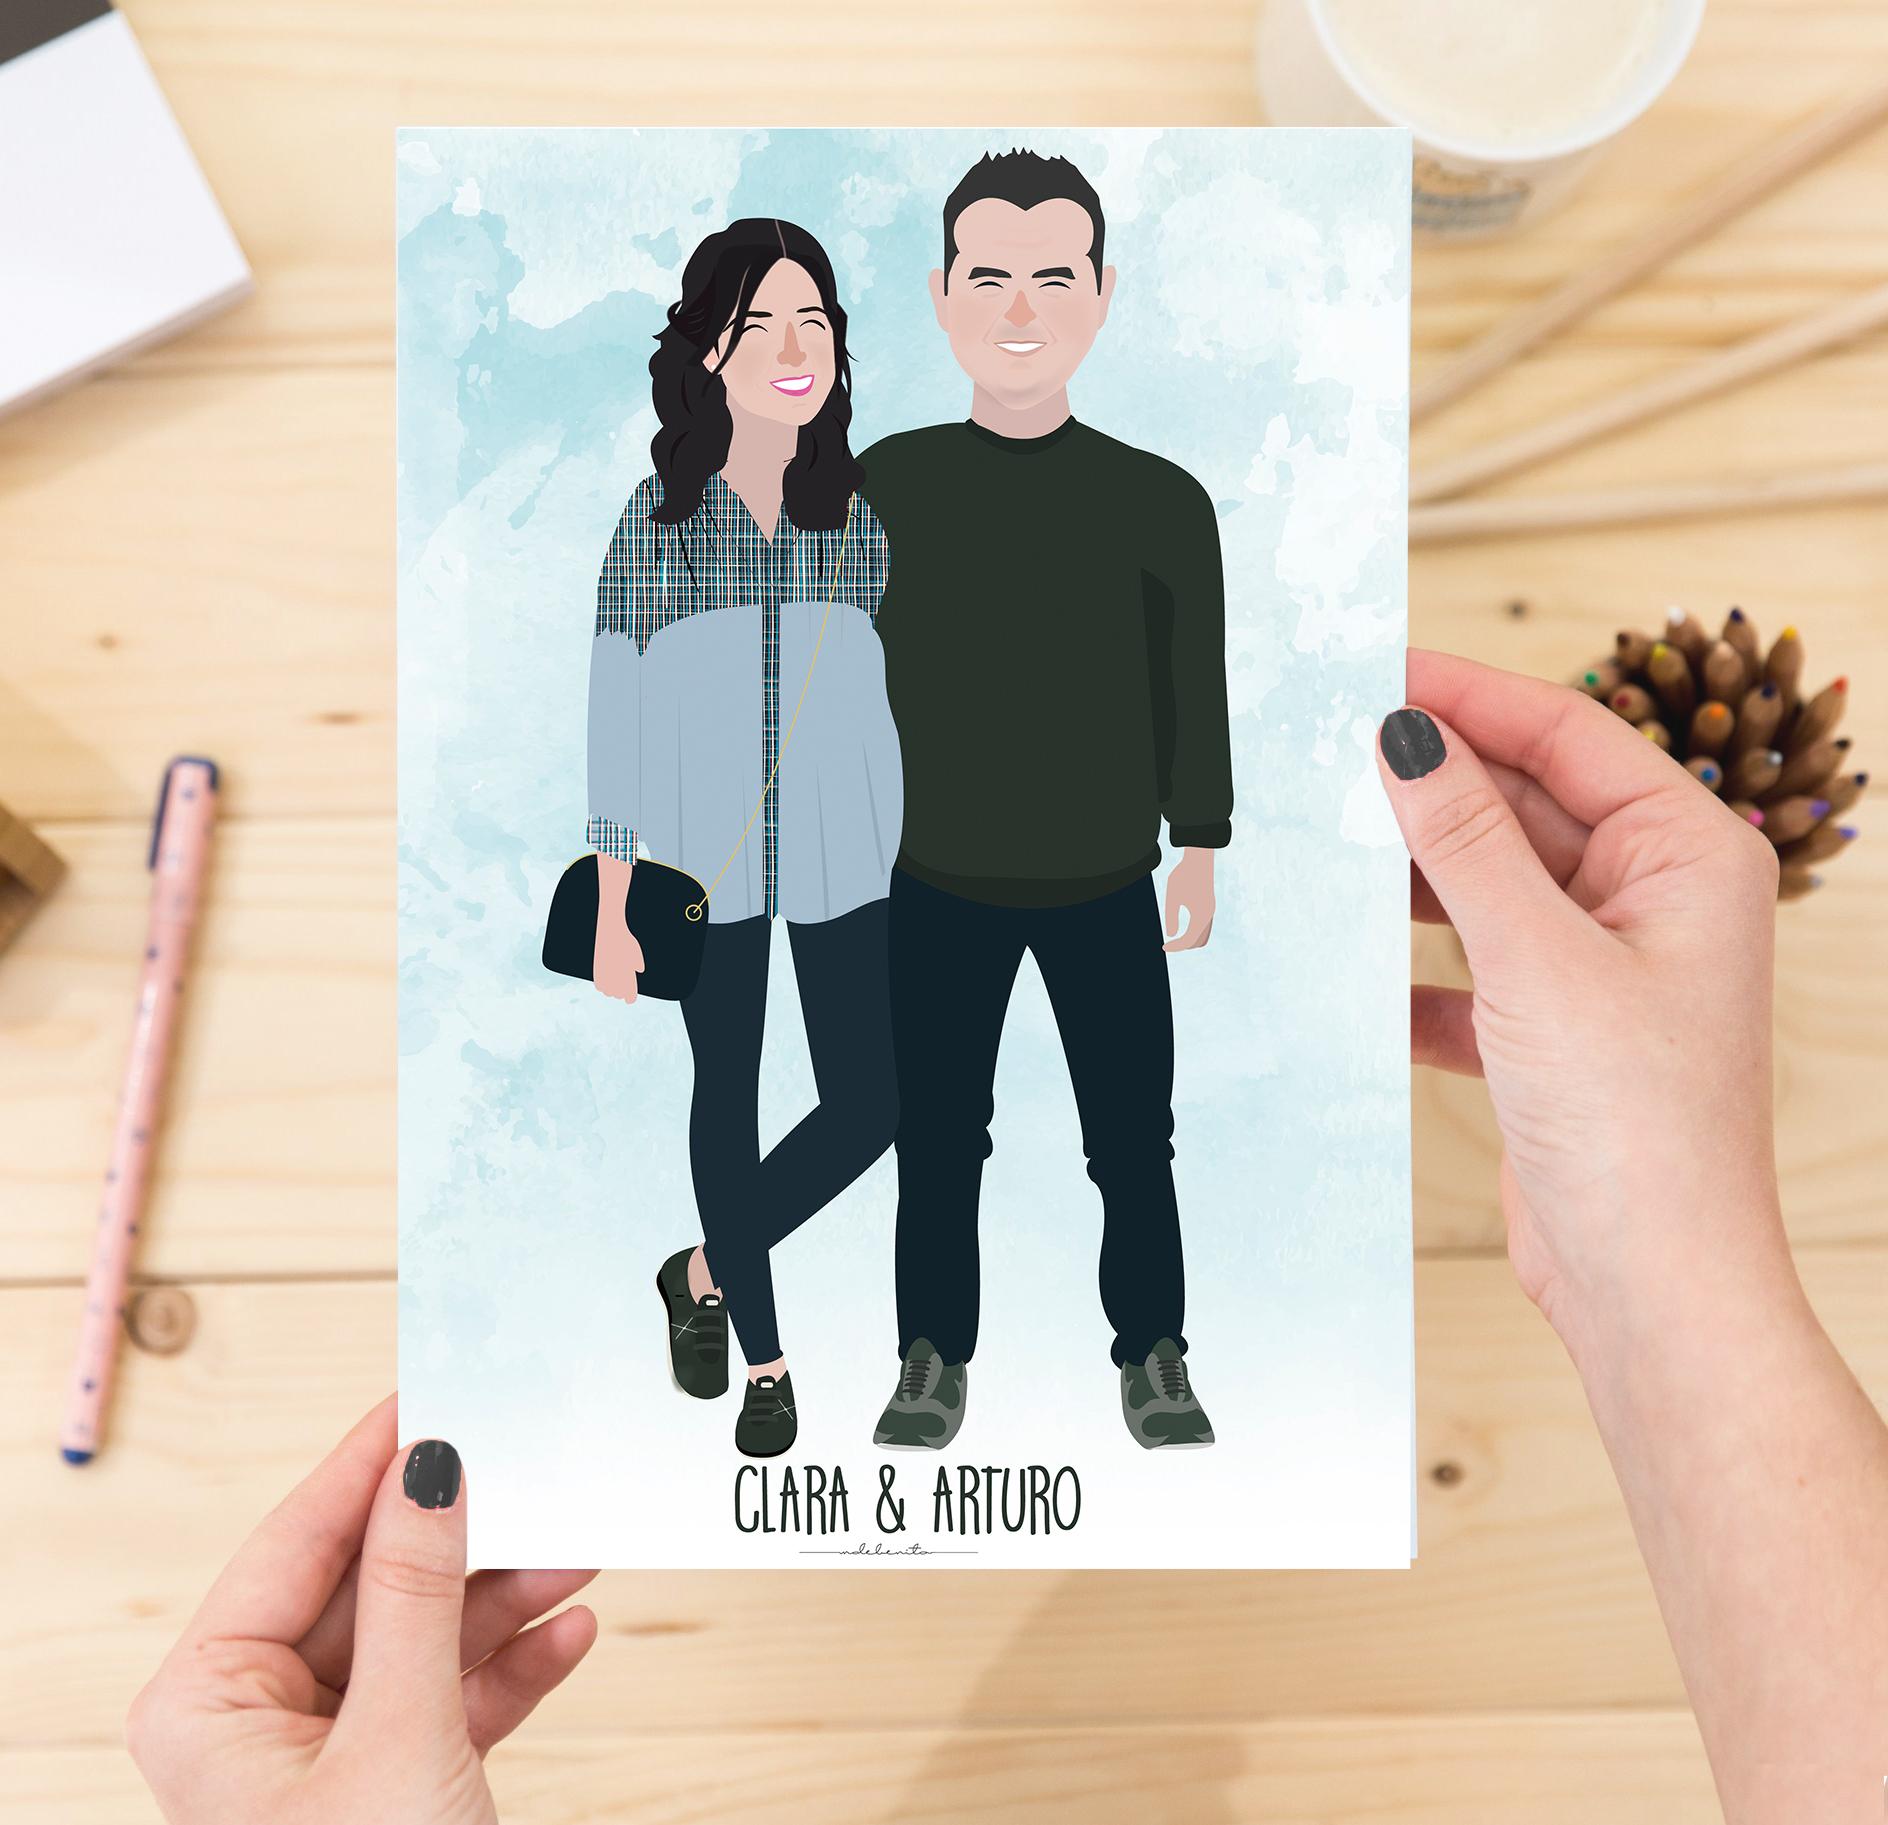 ilustracion-personalizada-mdebenito-pareja-novios-regalo-original.jpg